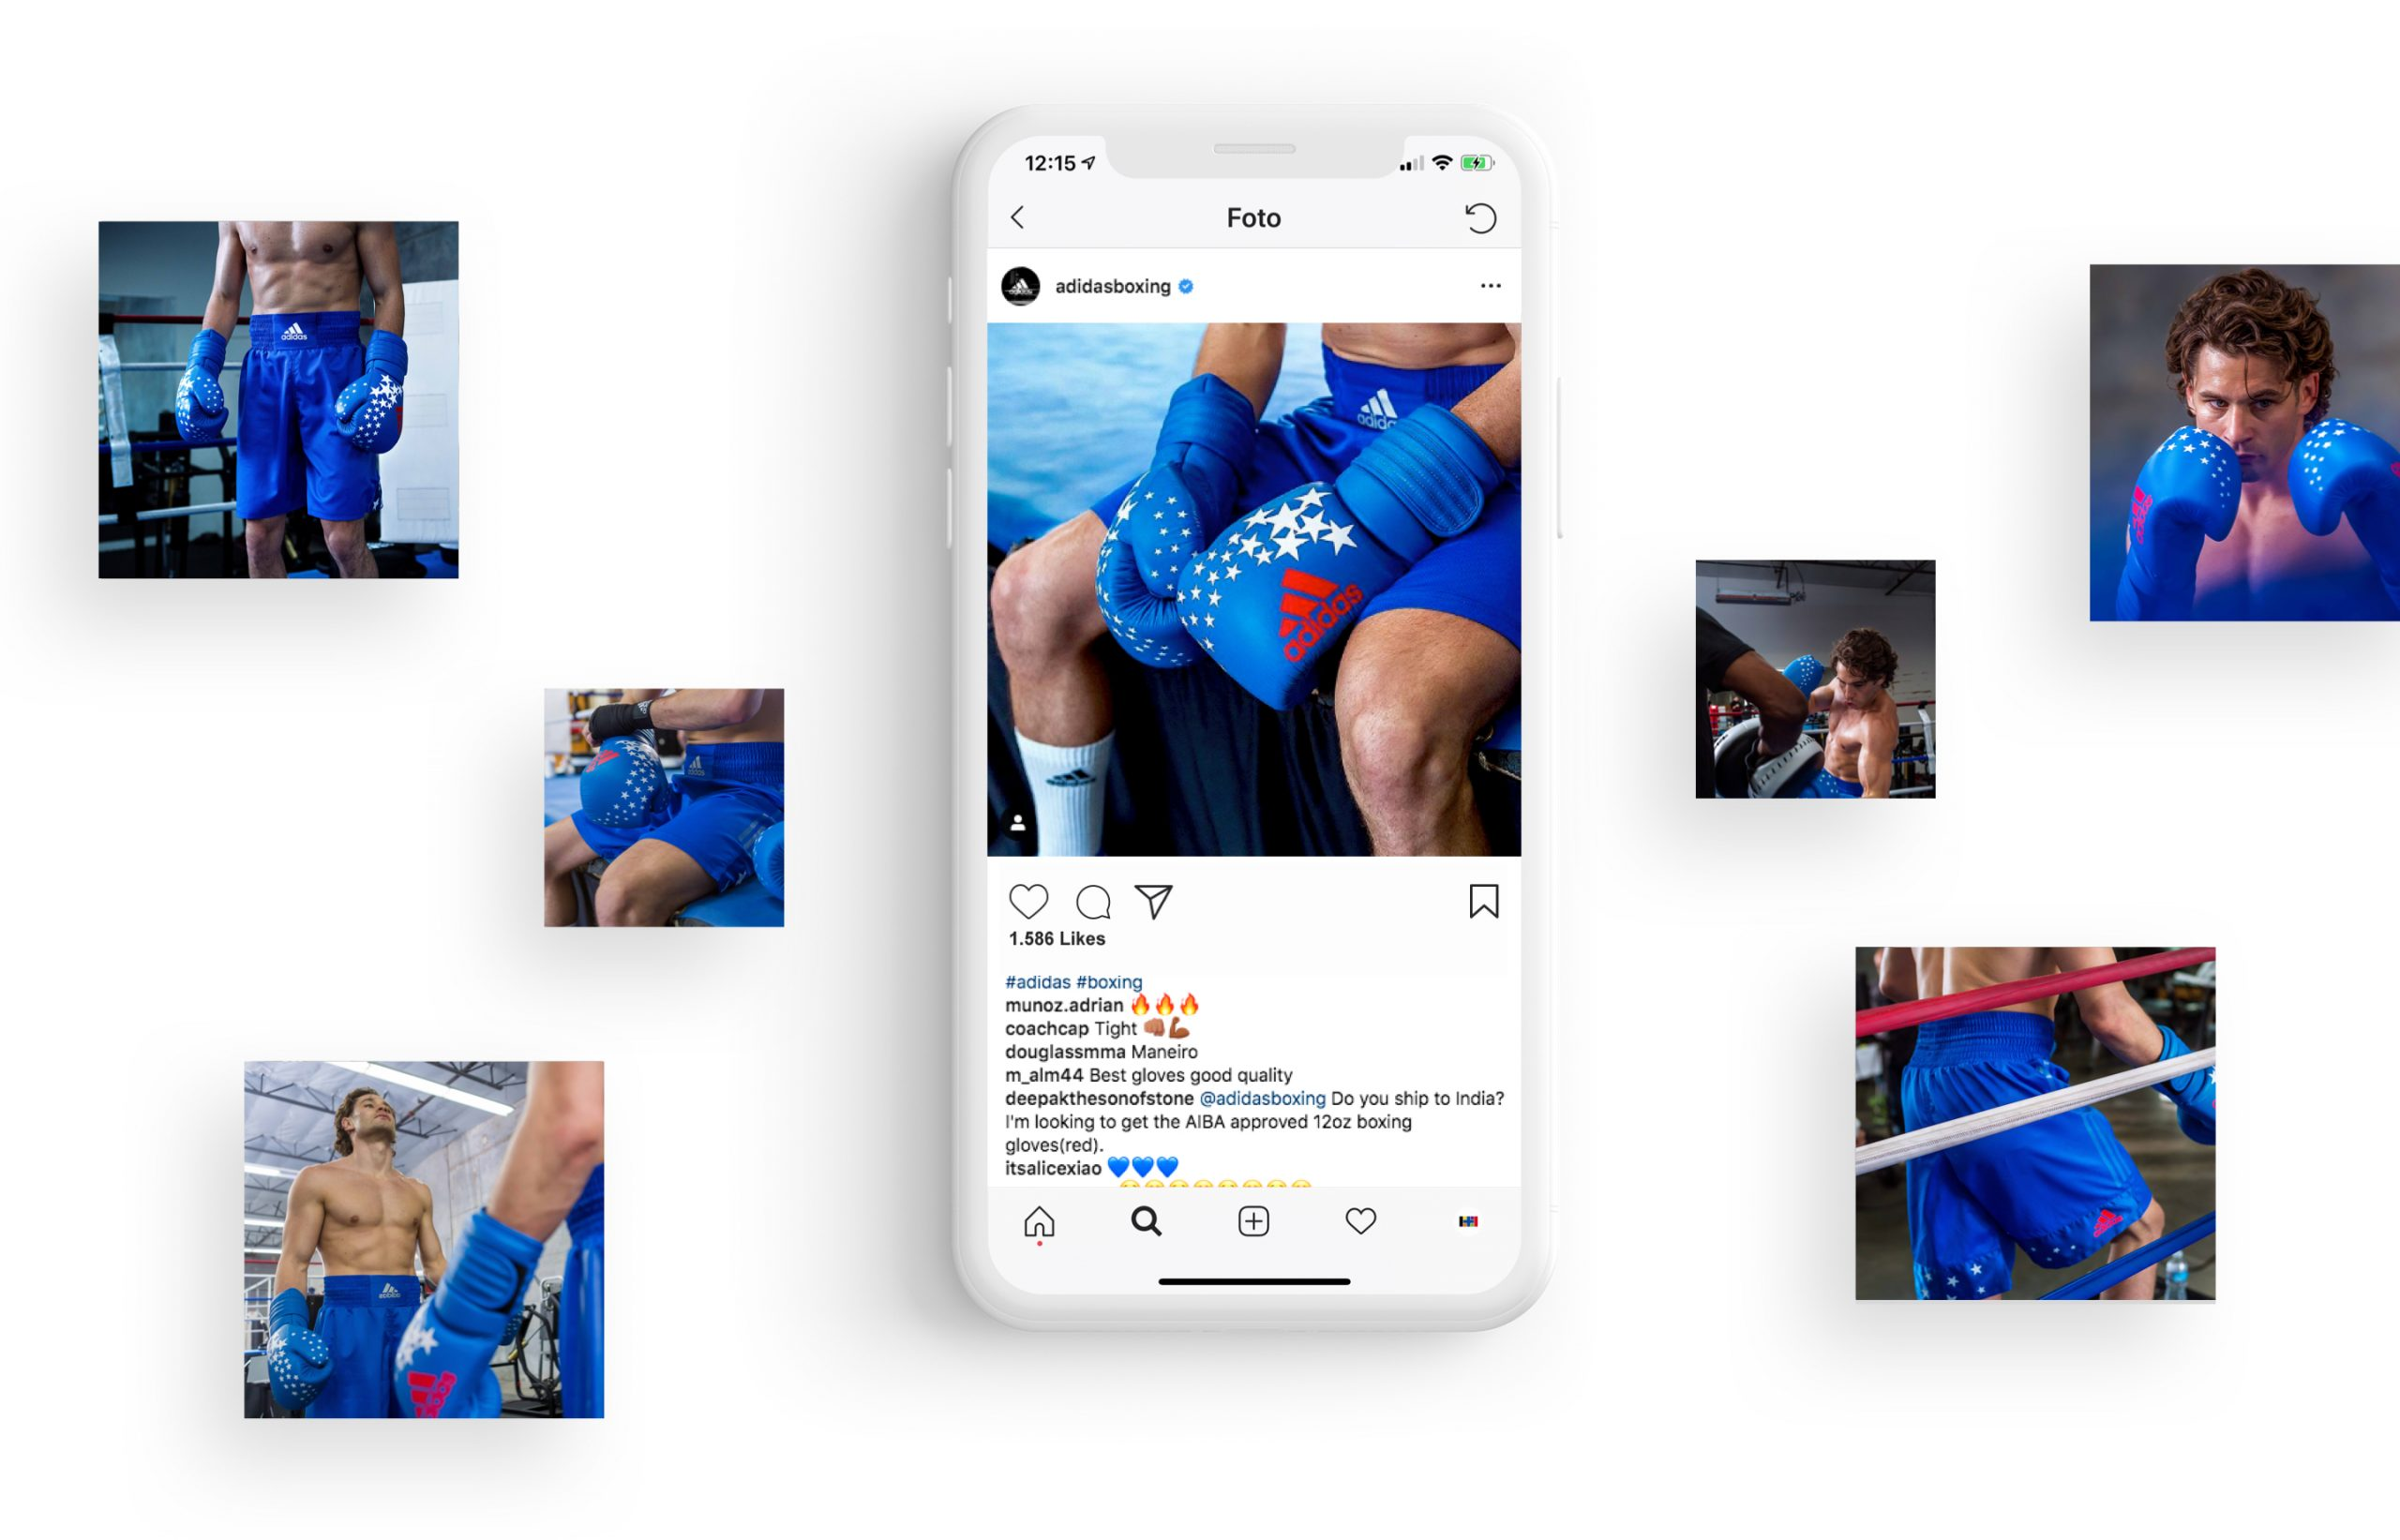 pascher-heinz-adidas-boxing-social-media